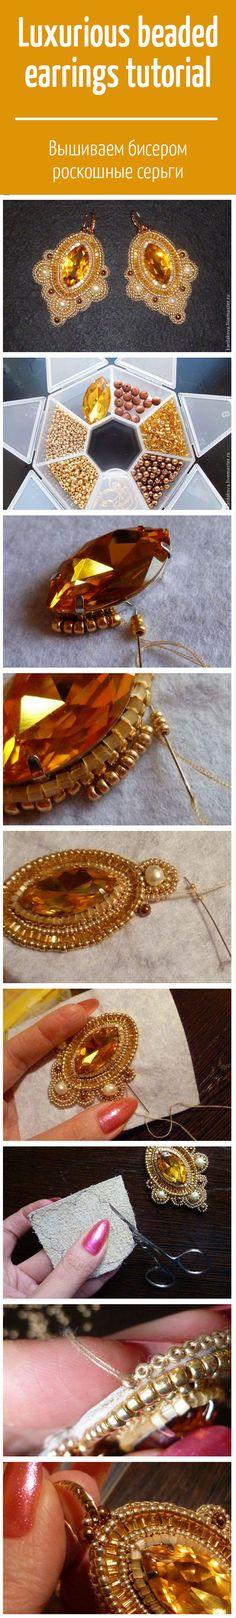 Luxurious beaded earrings tutorial / Вышиваем бисером роскошные серьги